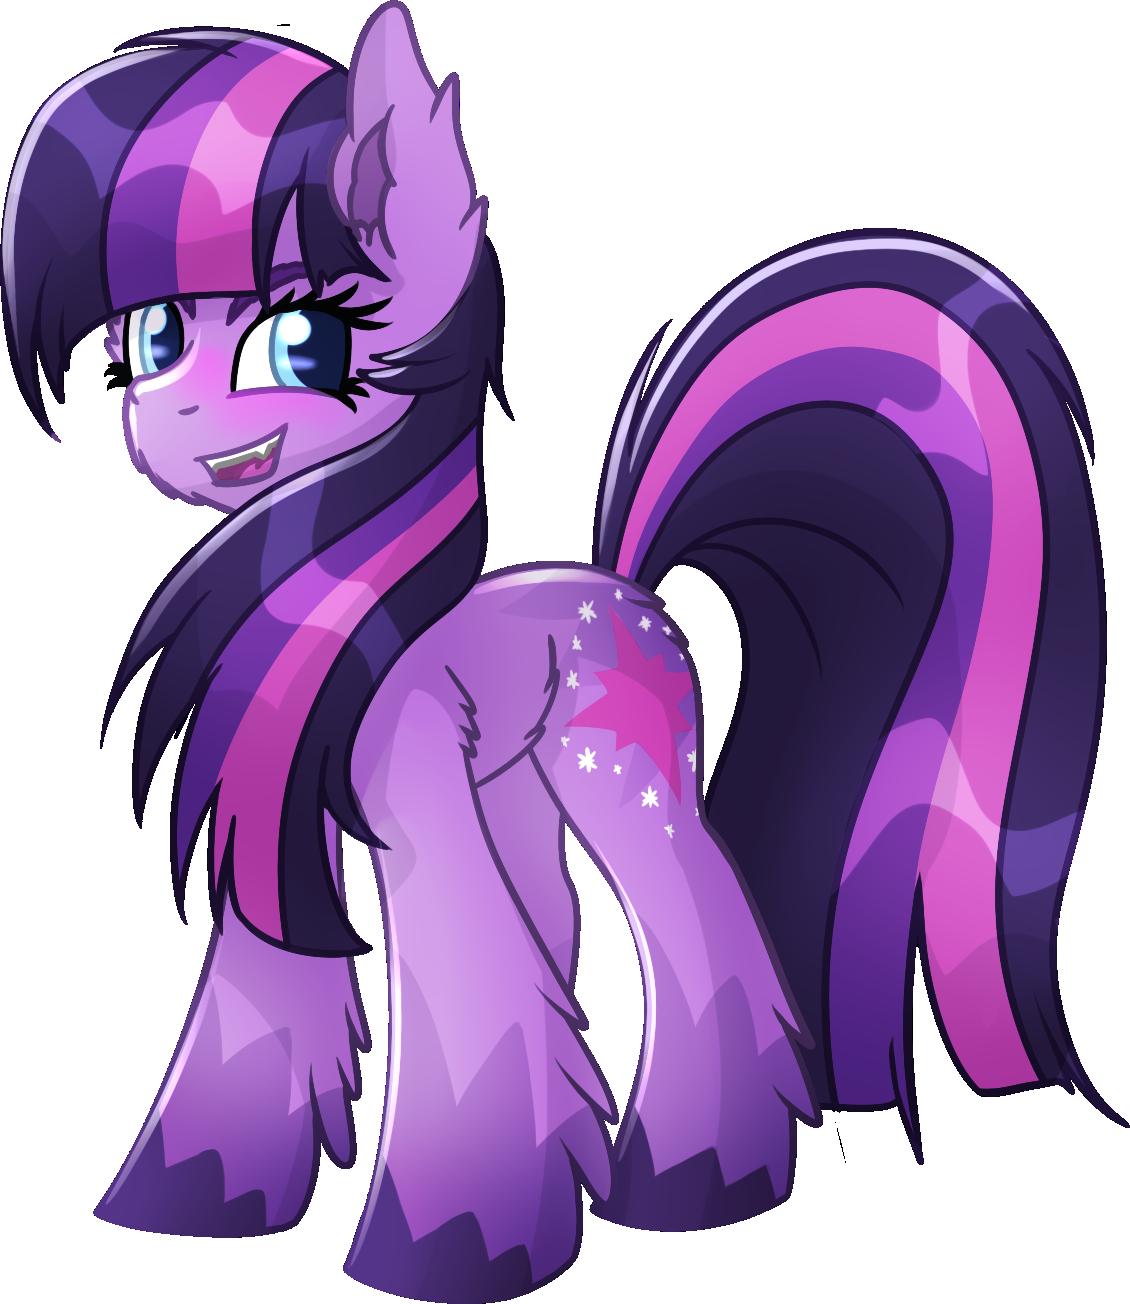 G5 Twilight Sparkle